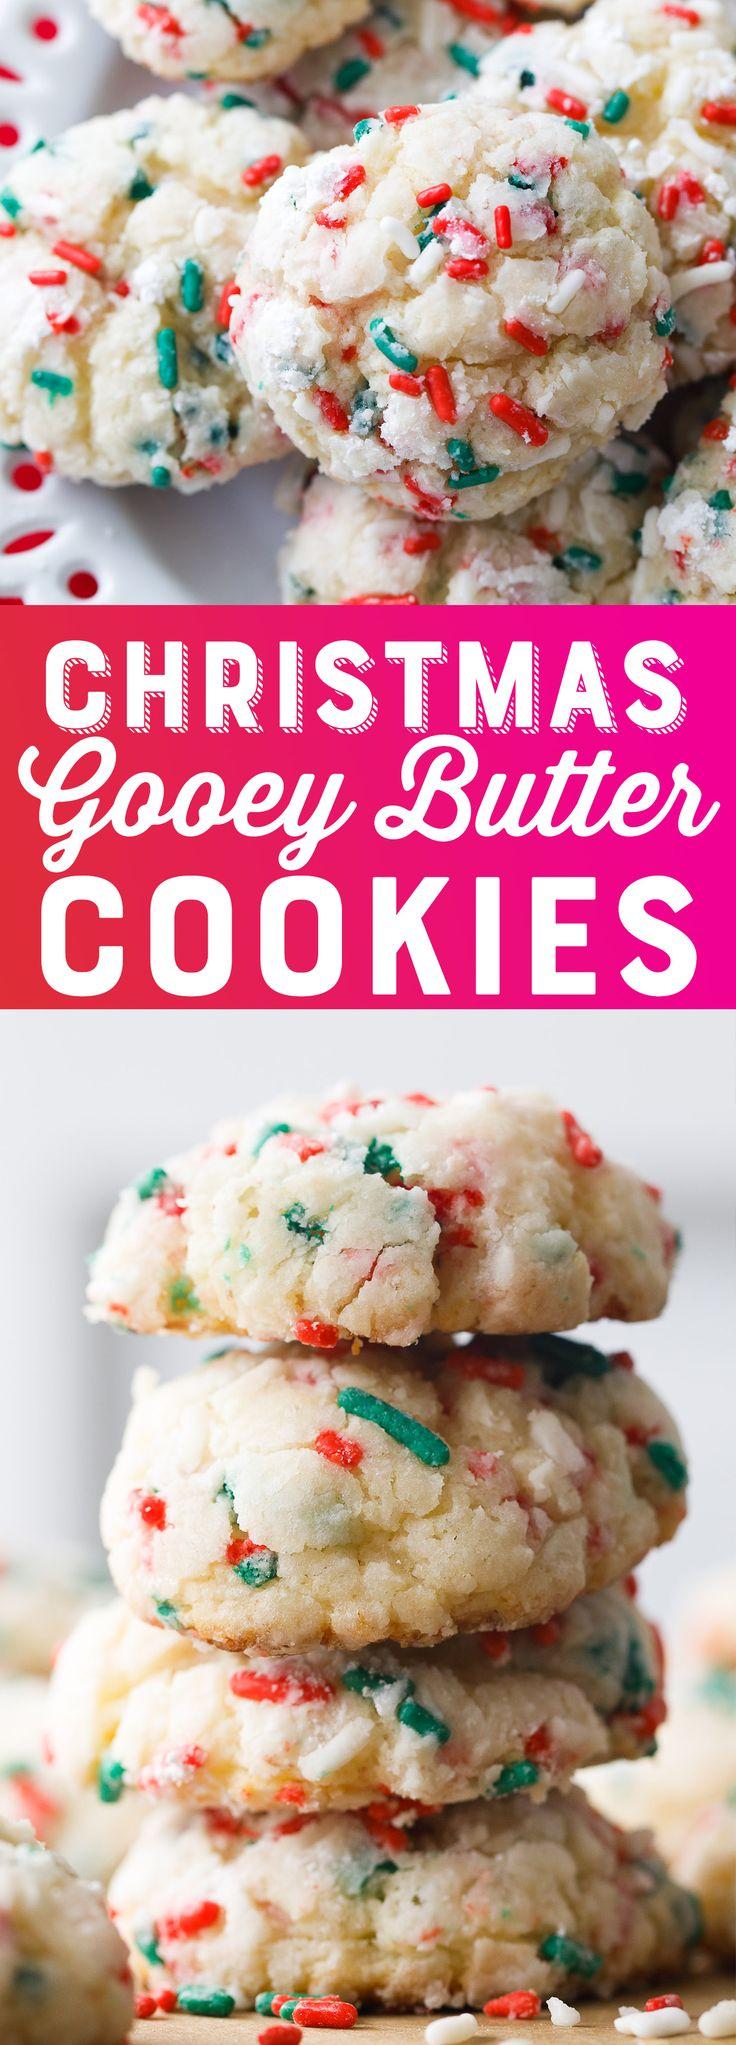 Christmas Gooey Butter Cookies Recipe - Easy Christmas Cookies - Cake Mix Cookies - Gooey Butter Recipe #ChristmasCookies #Christmas #Holiday #Cookies